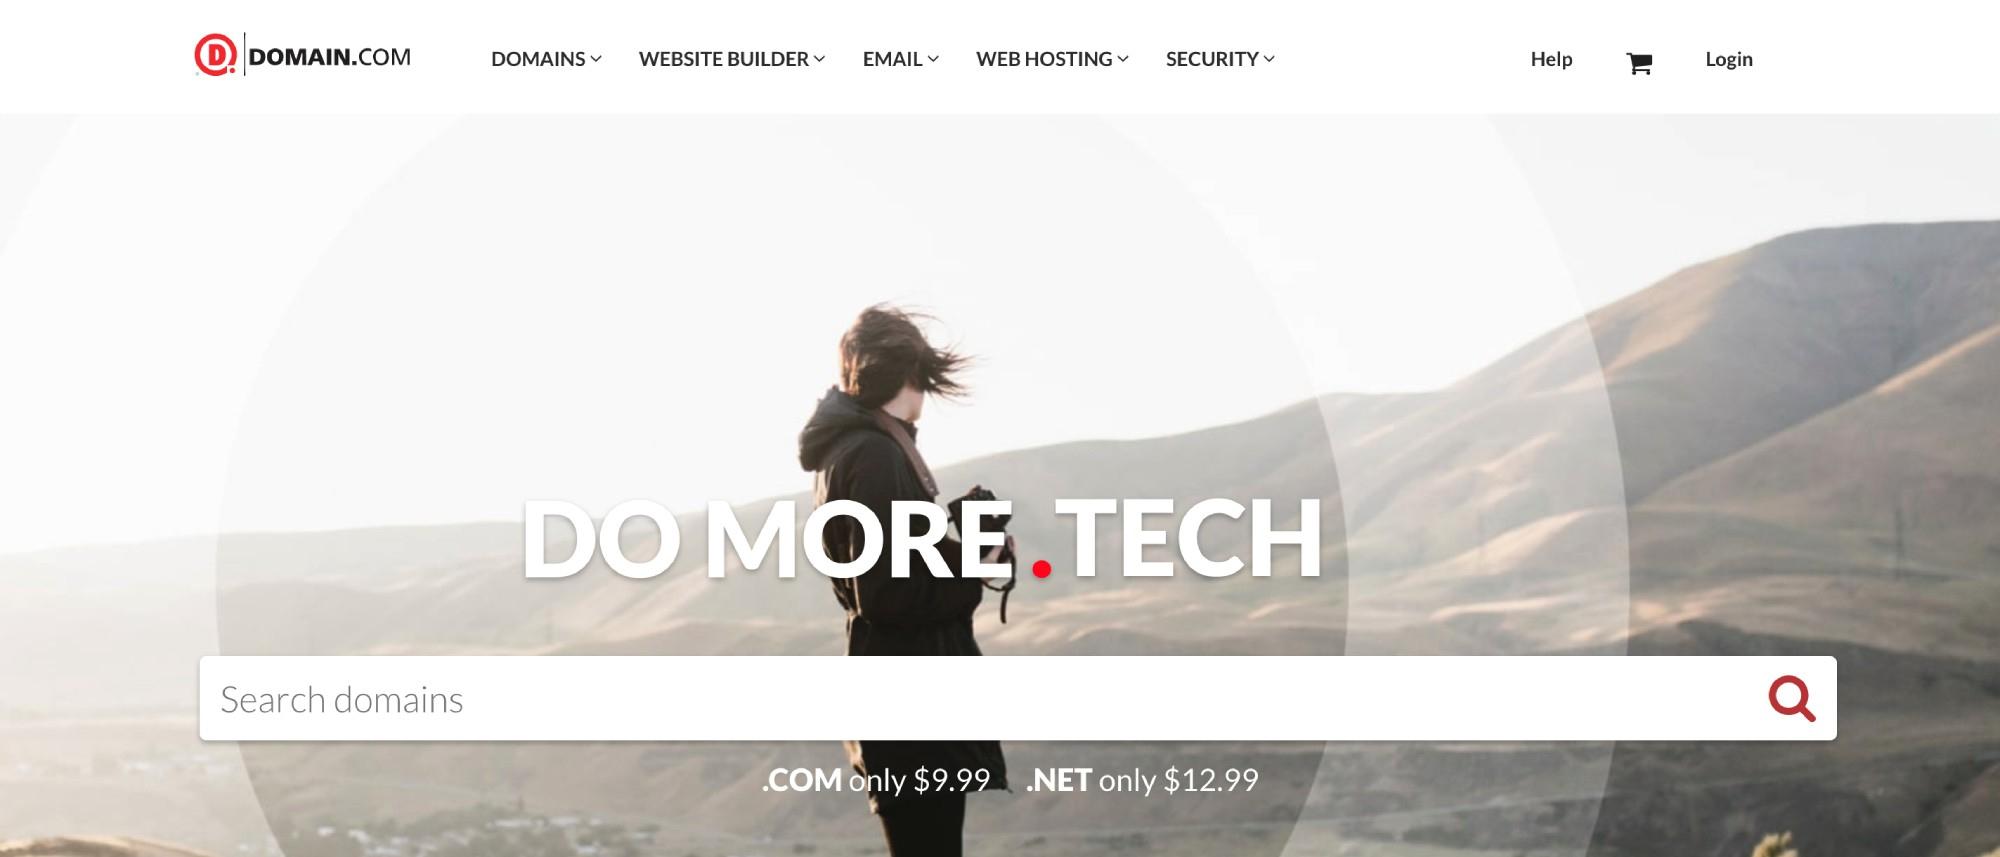 Domain.com网站提供待售的高级域名